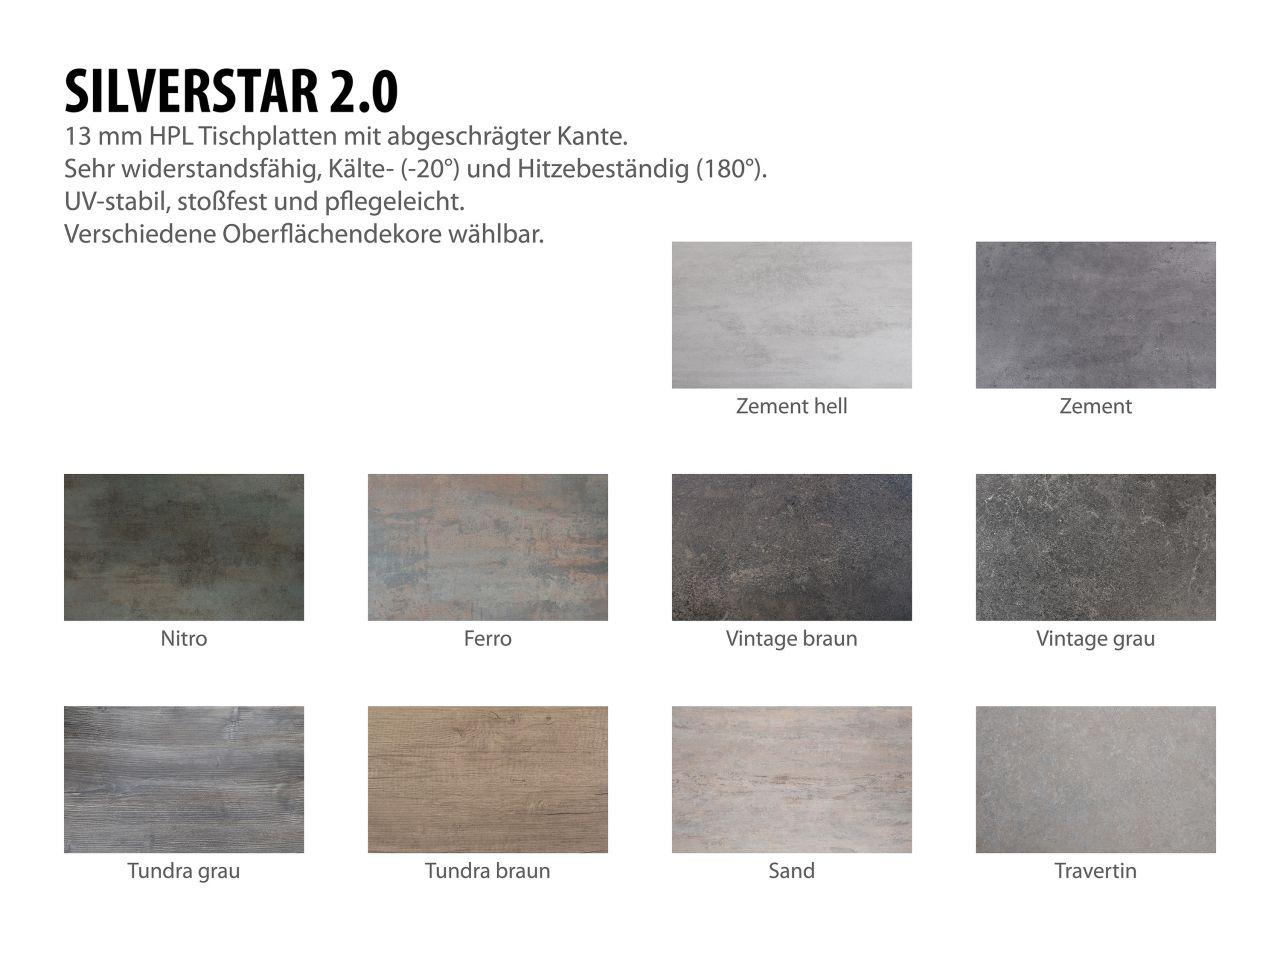 Gartentisch 250x100cm Aluminium weiß/Silverstar 2.0